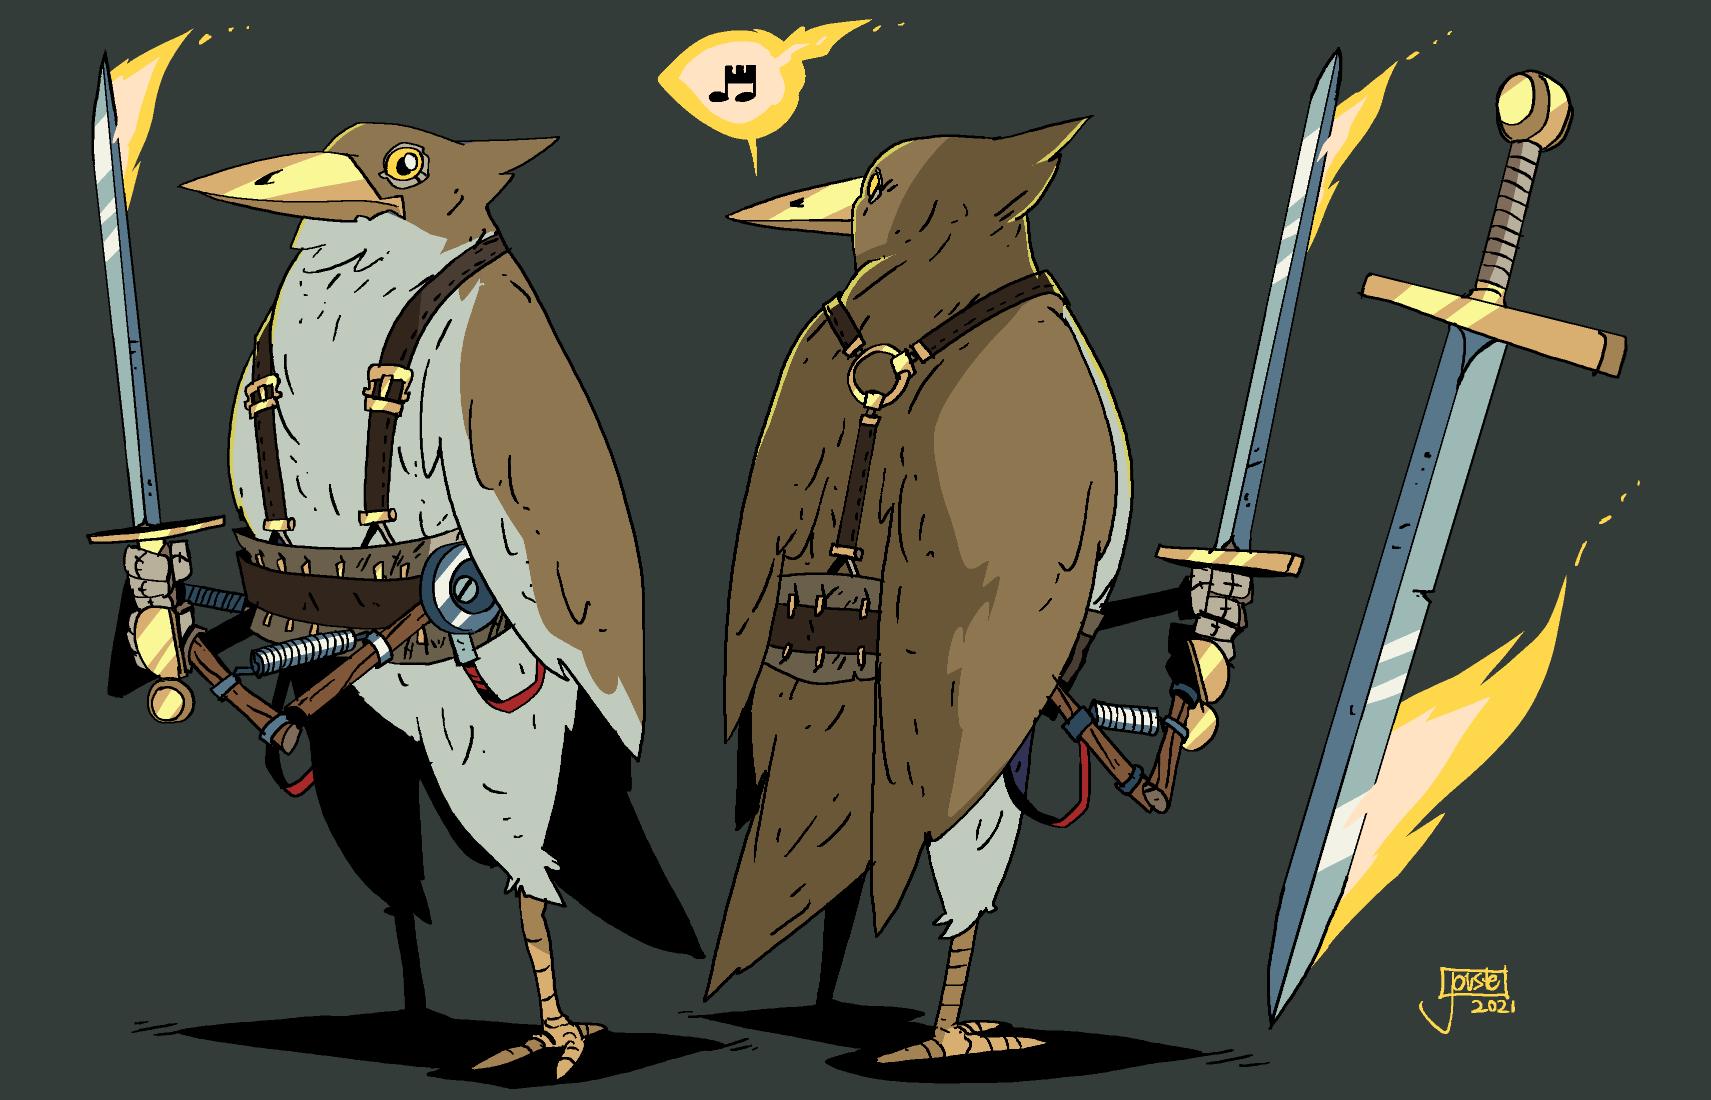 Sir Bird the Knightengale